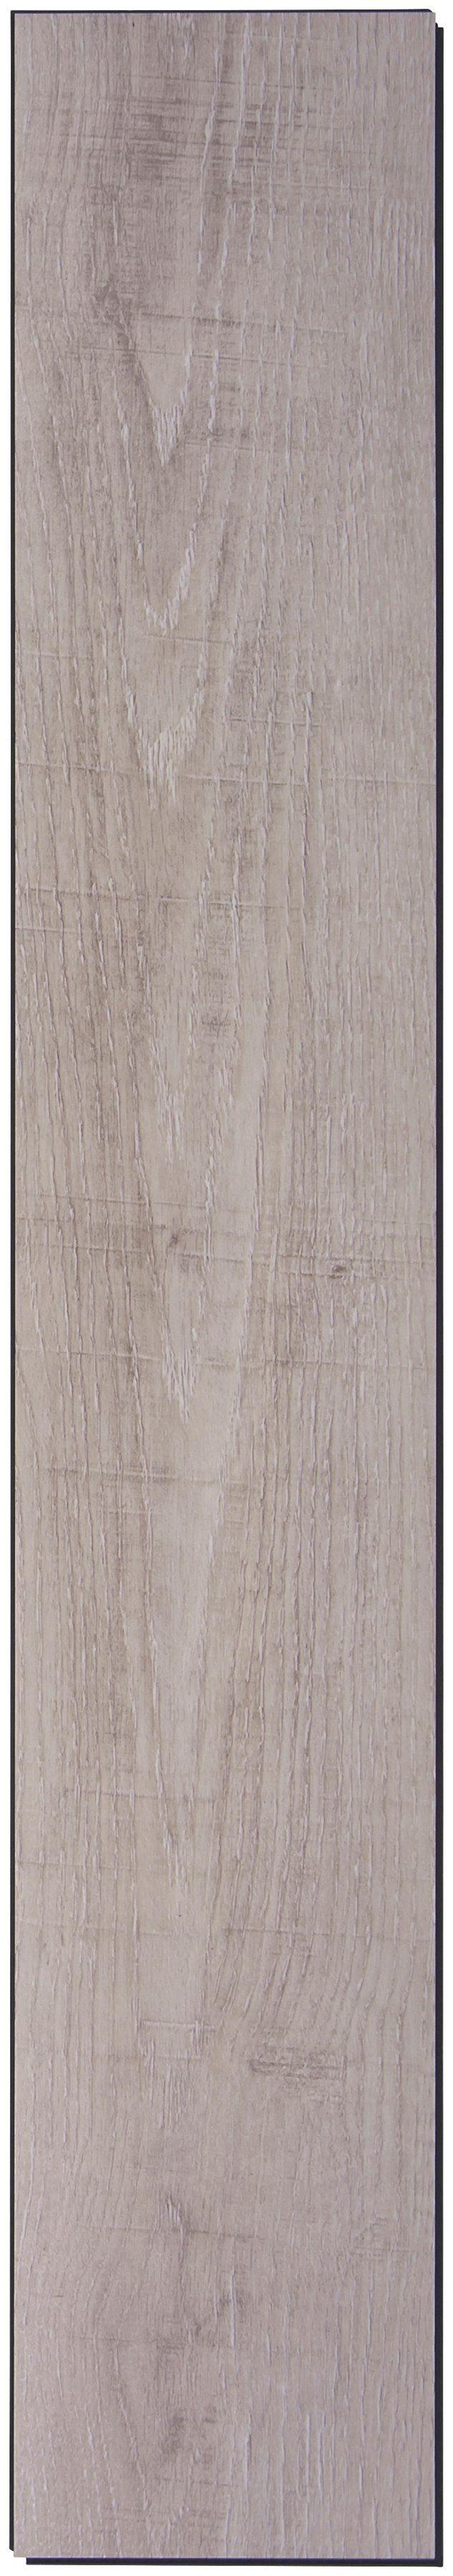 PVC-Boden »PVC-Planke 3,2 mm«, mit Klick-Verbindung